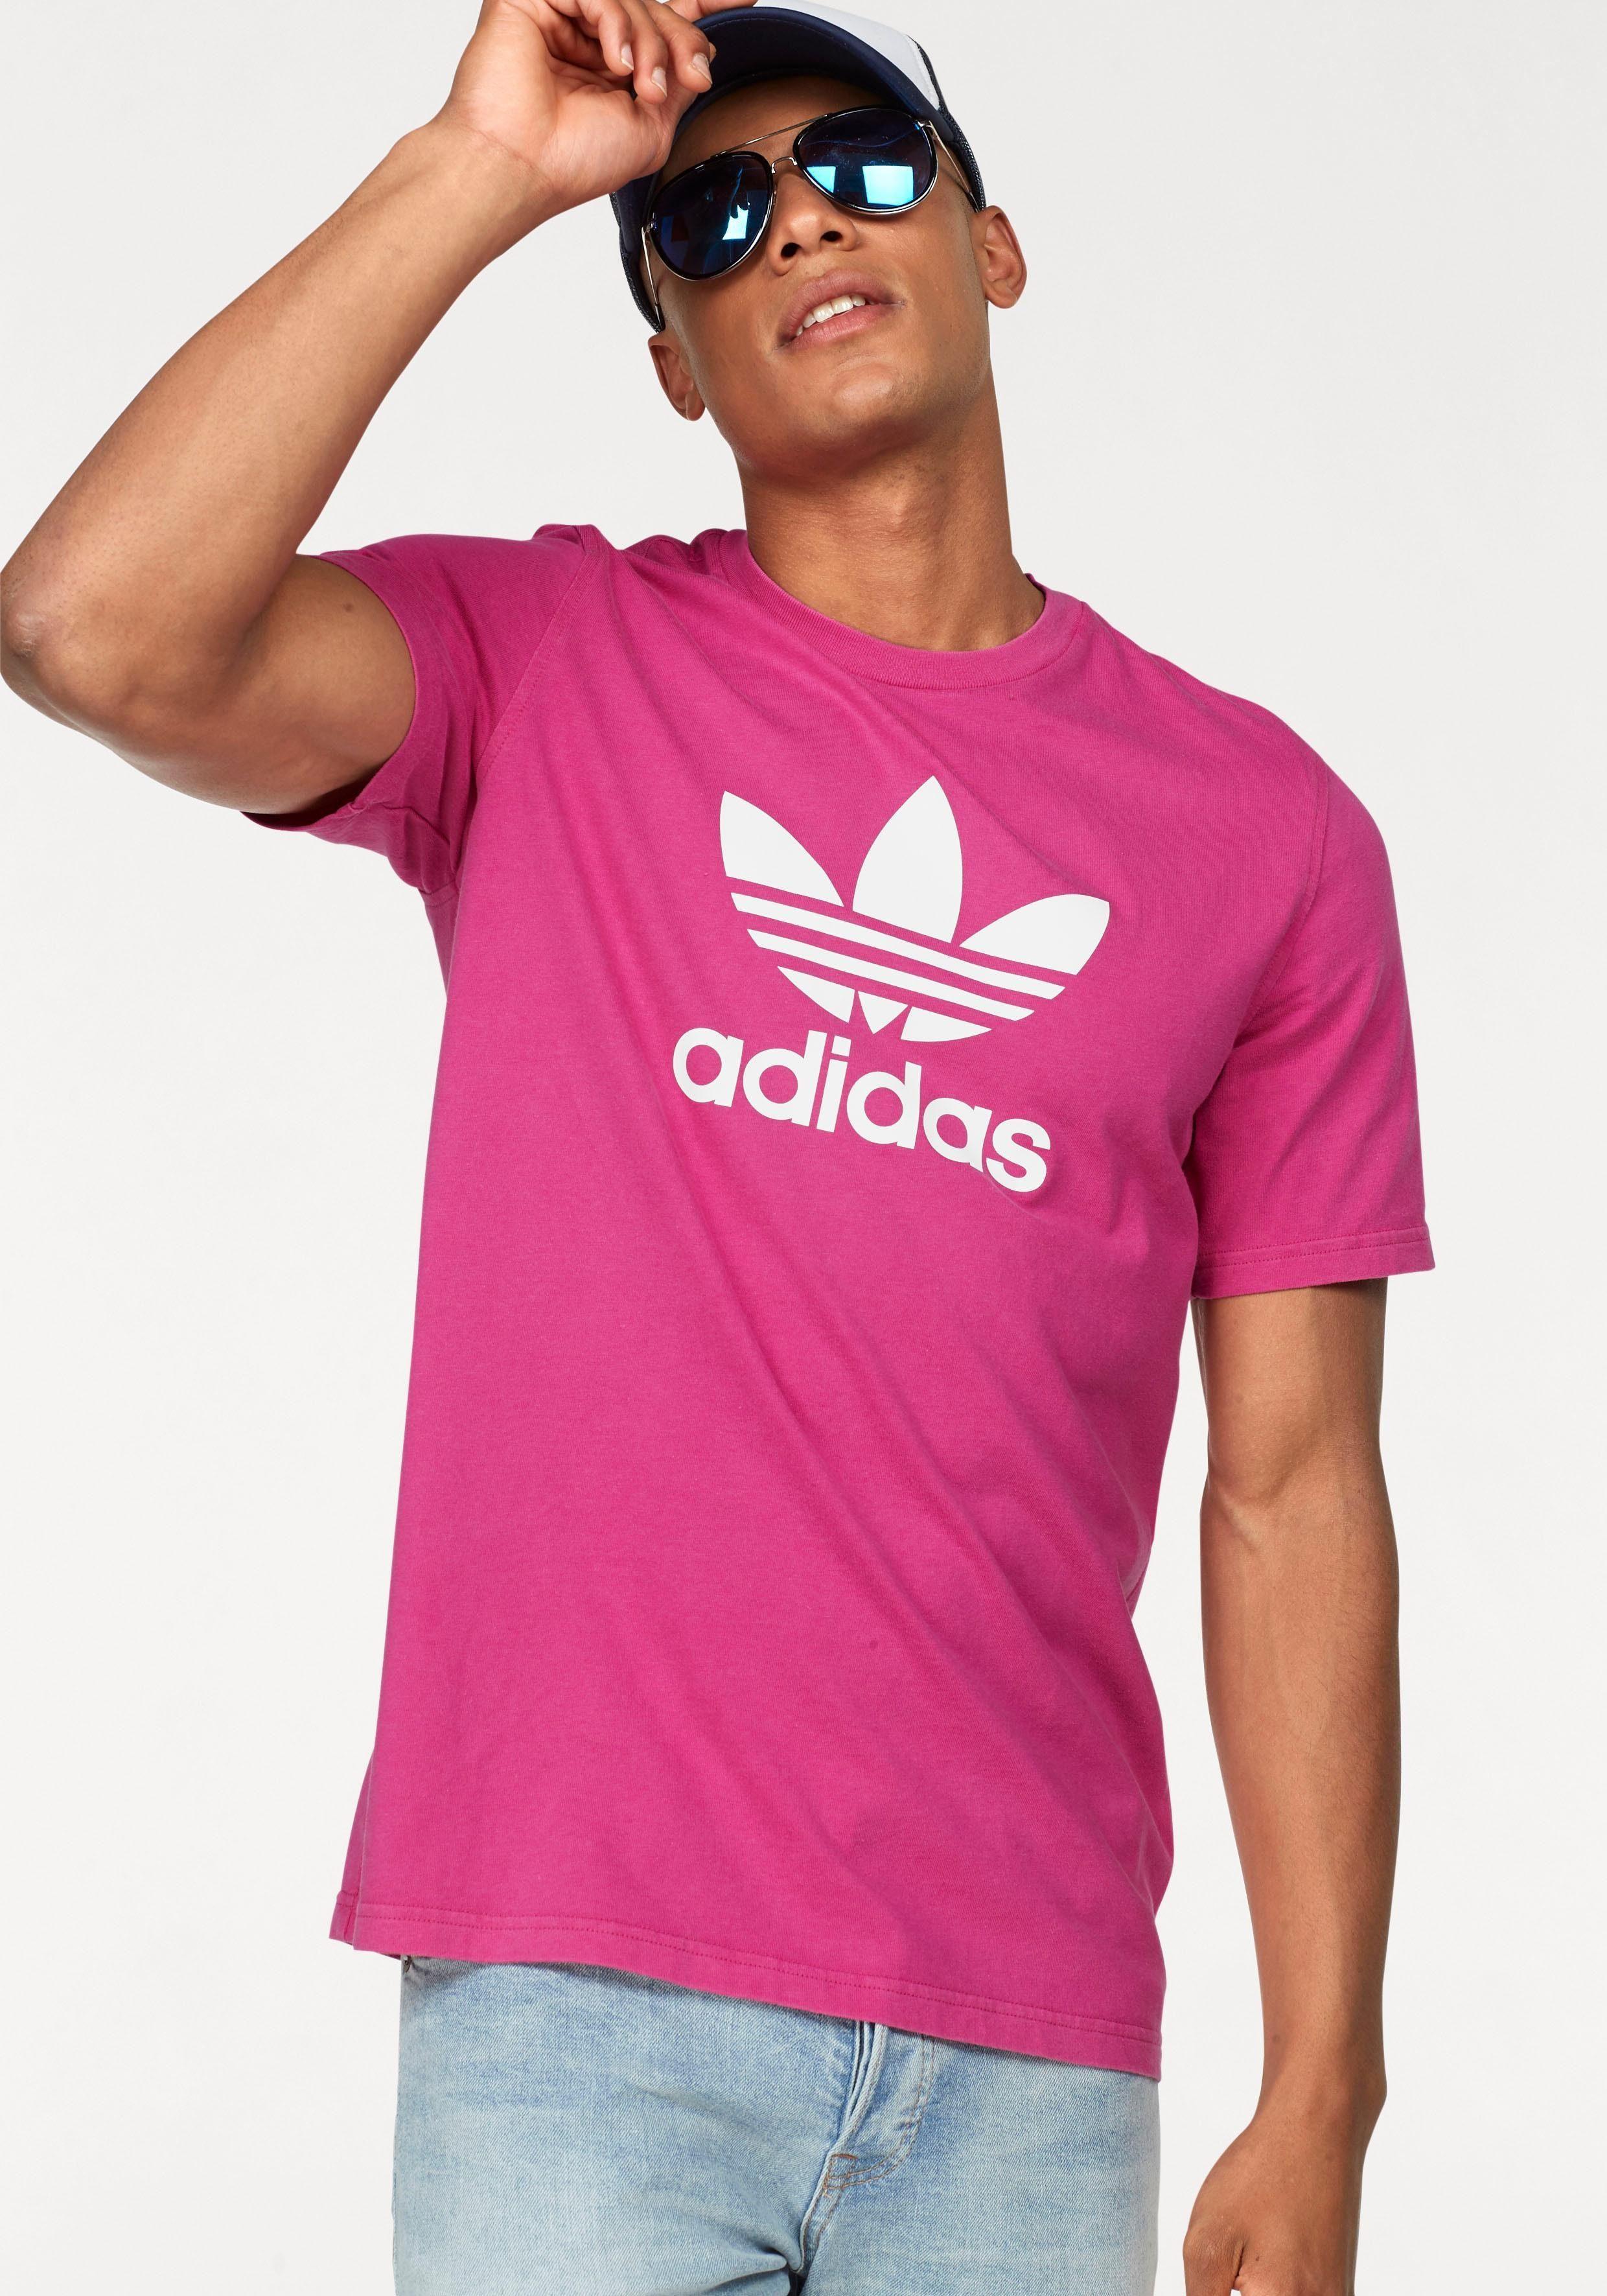 Originals Adidas Afbeeldingsbron Shirt »trefoil T Shirt« 5FwxPwqZ